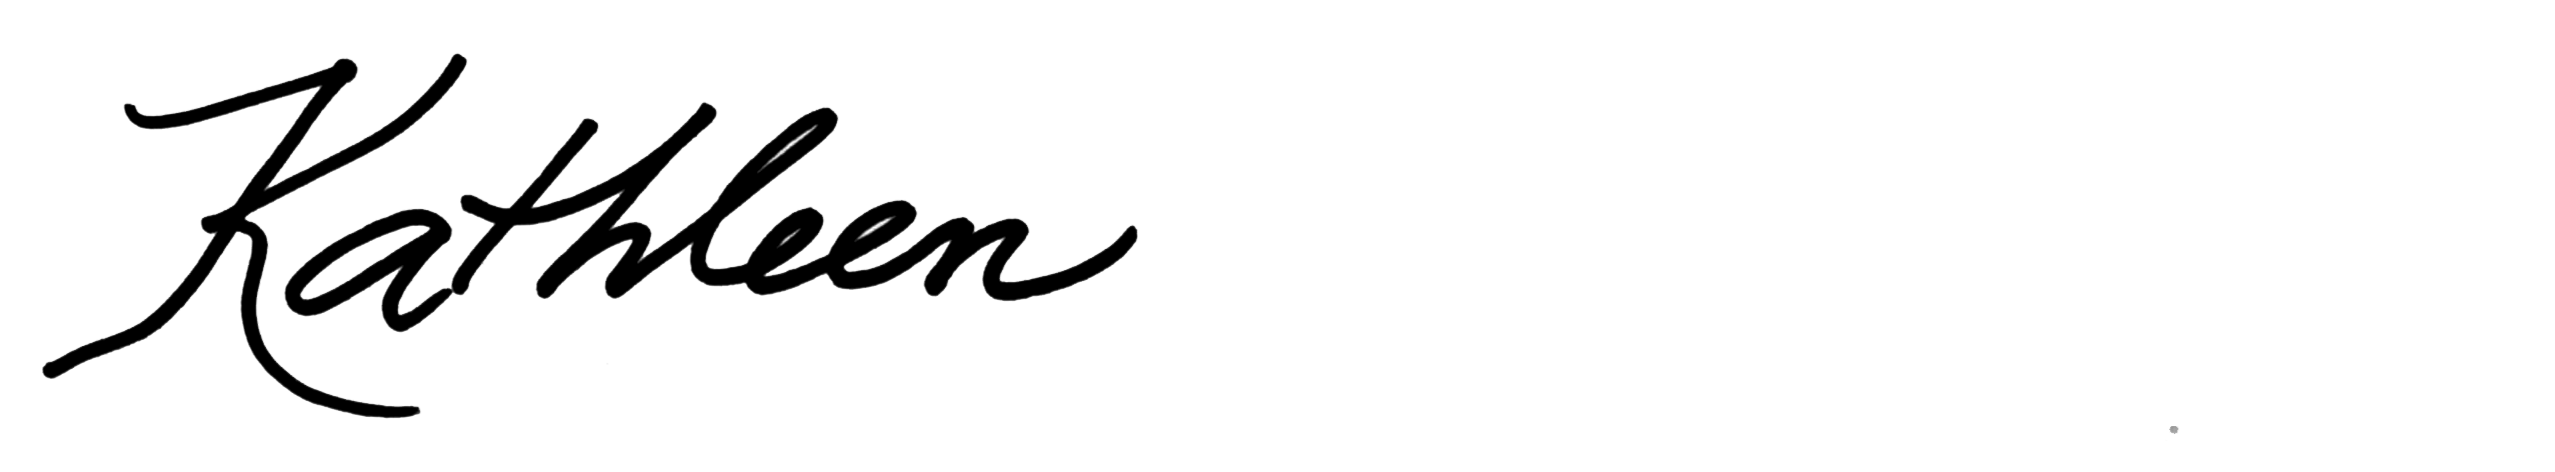 kathleen-mclaughlin-firstname-signature